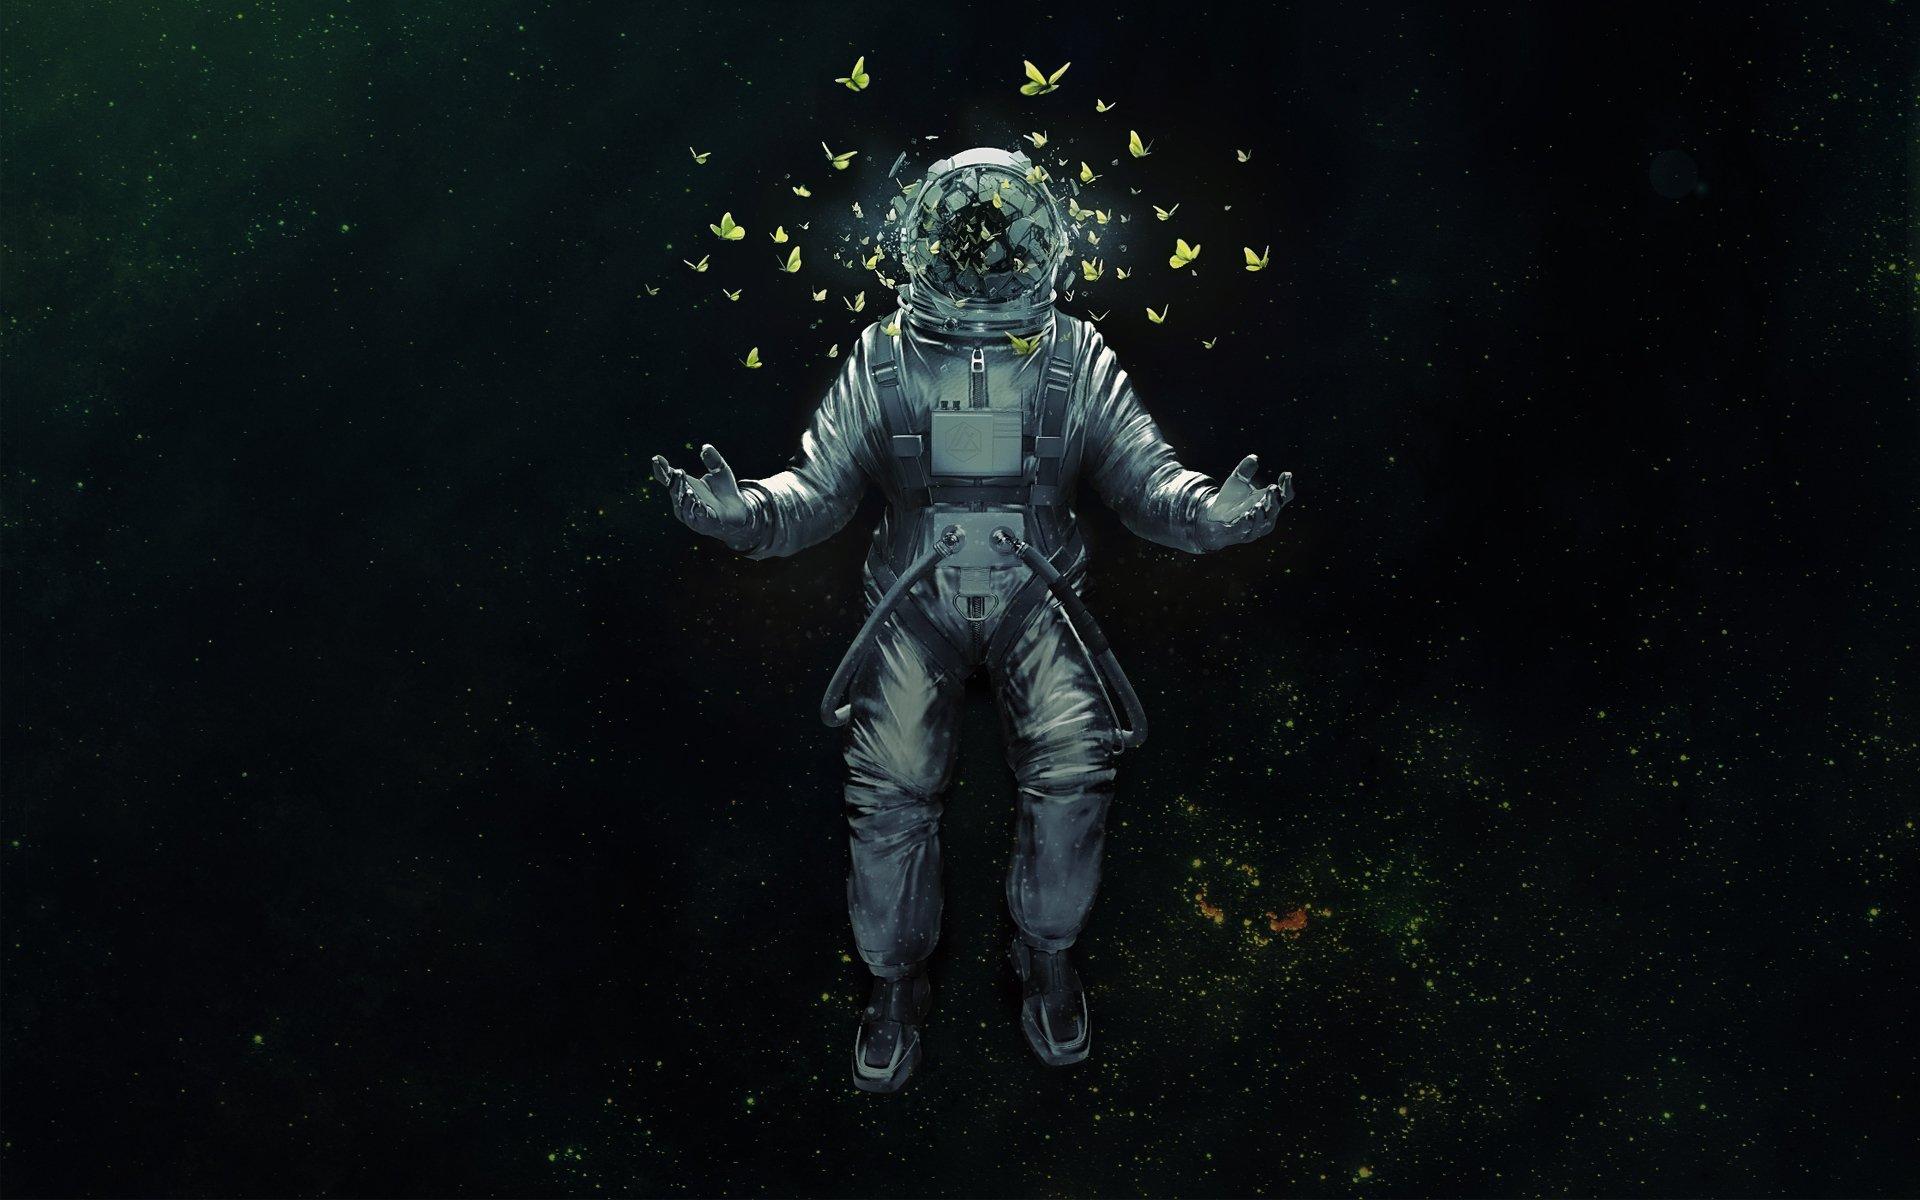 astronaut spaceman - photo #29